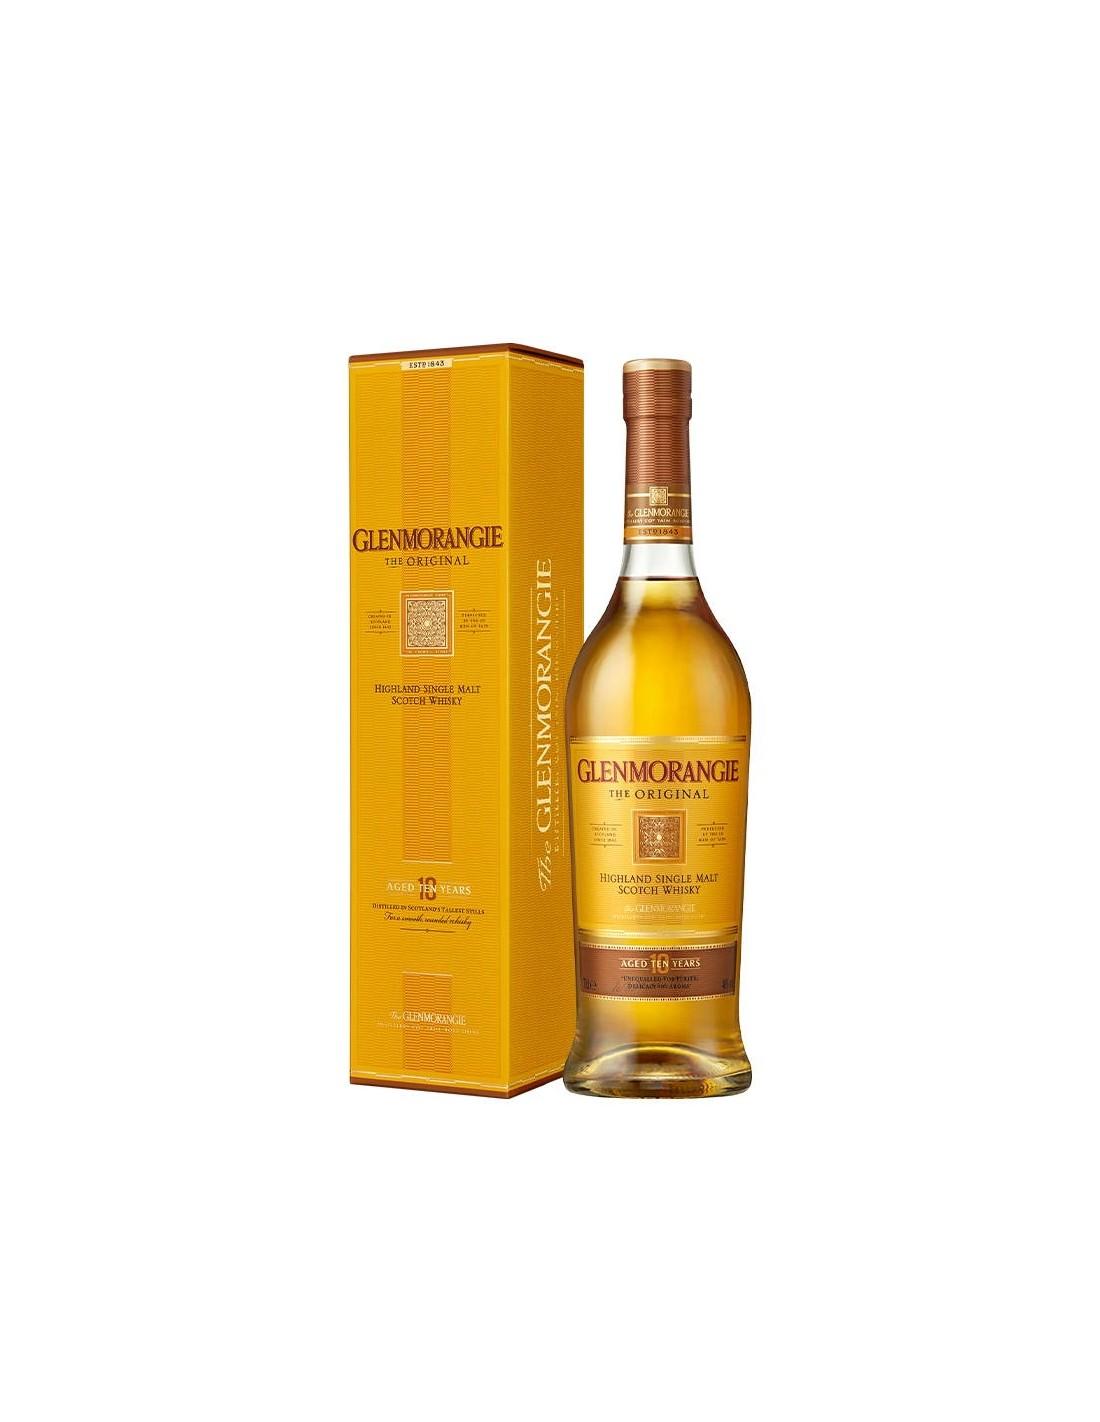 Whisky Glenmorangie, 10 ani, 40% alc., 0.7L, Scotia